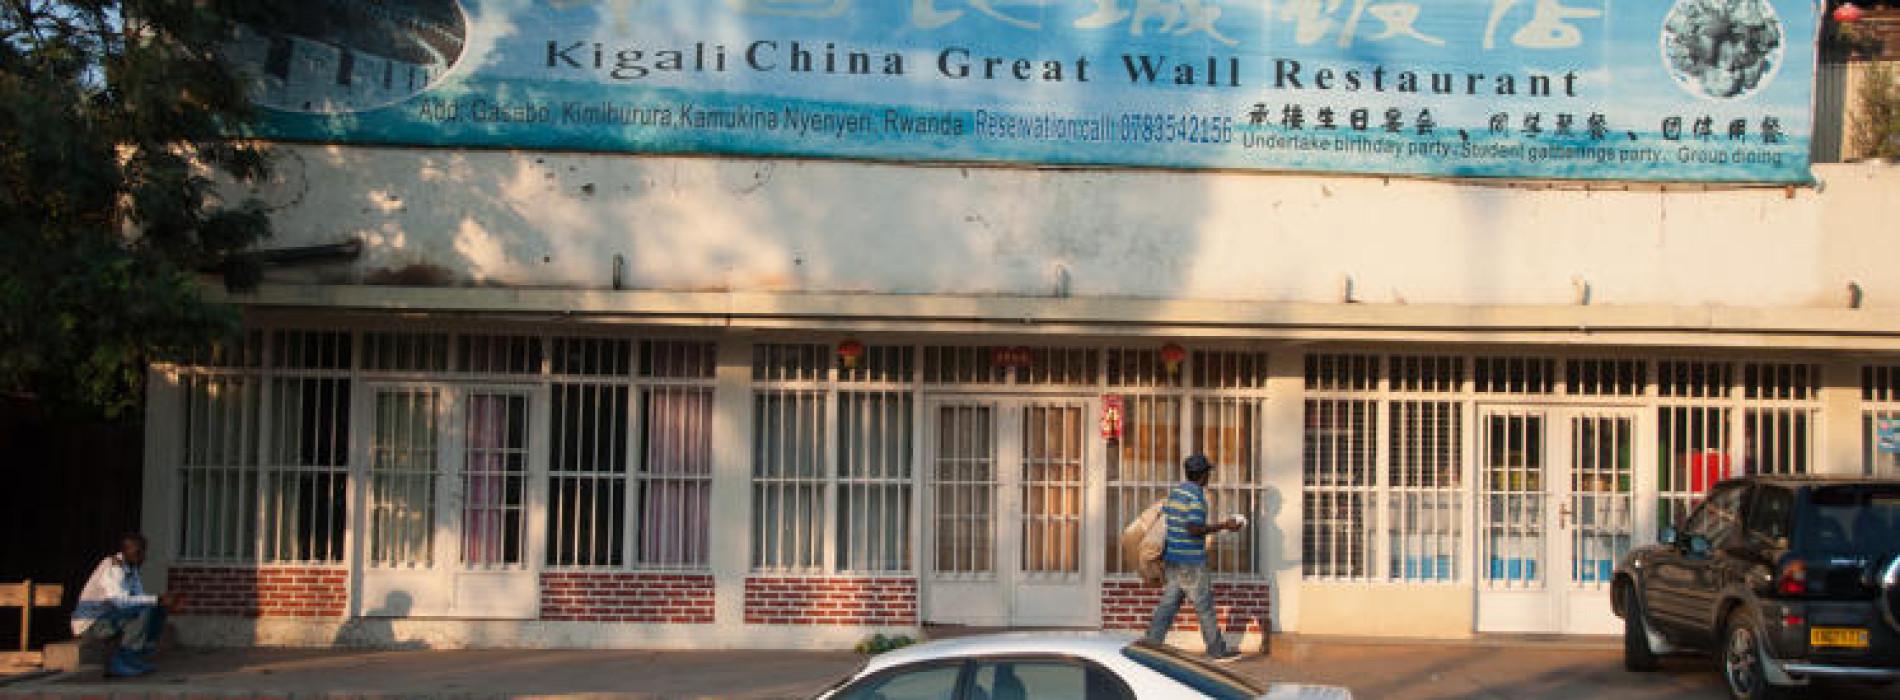 In Africa, gli sviluppatori cinesi stanno costruendo una Mini Cina